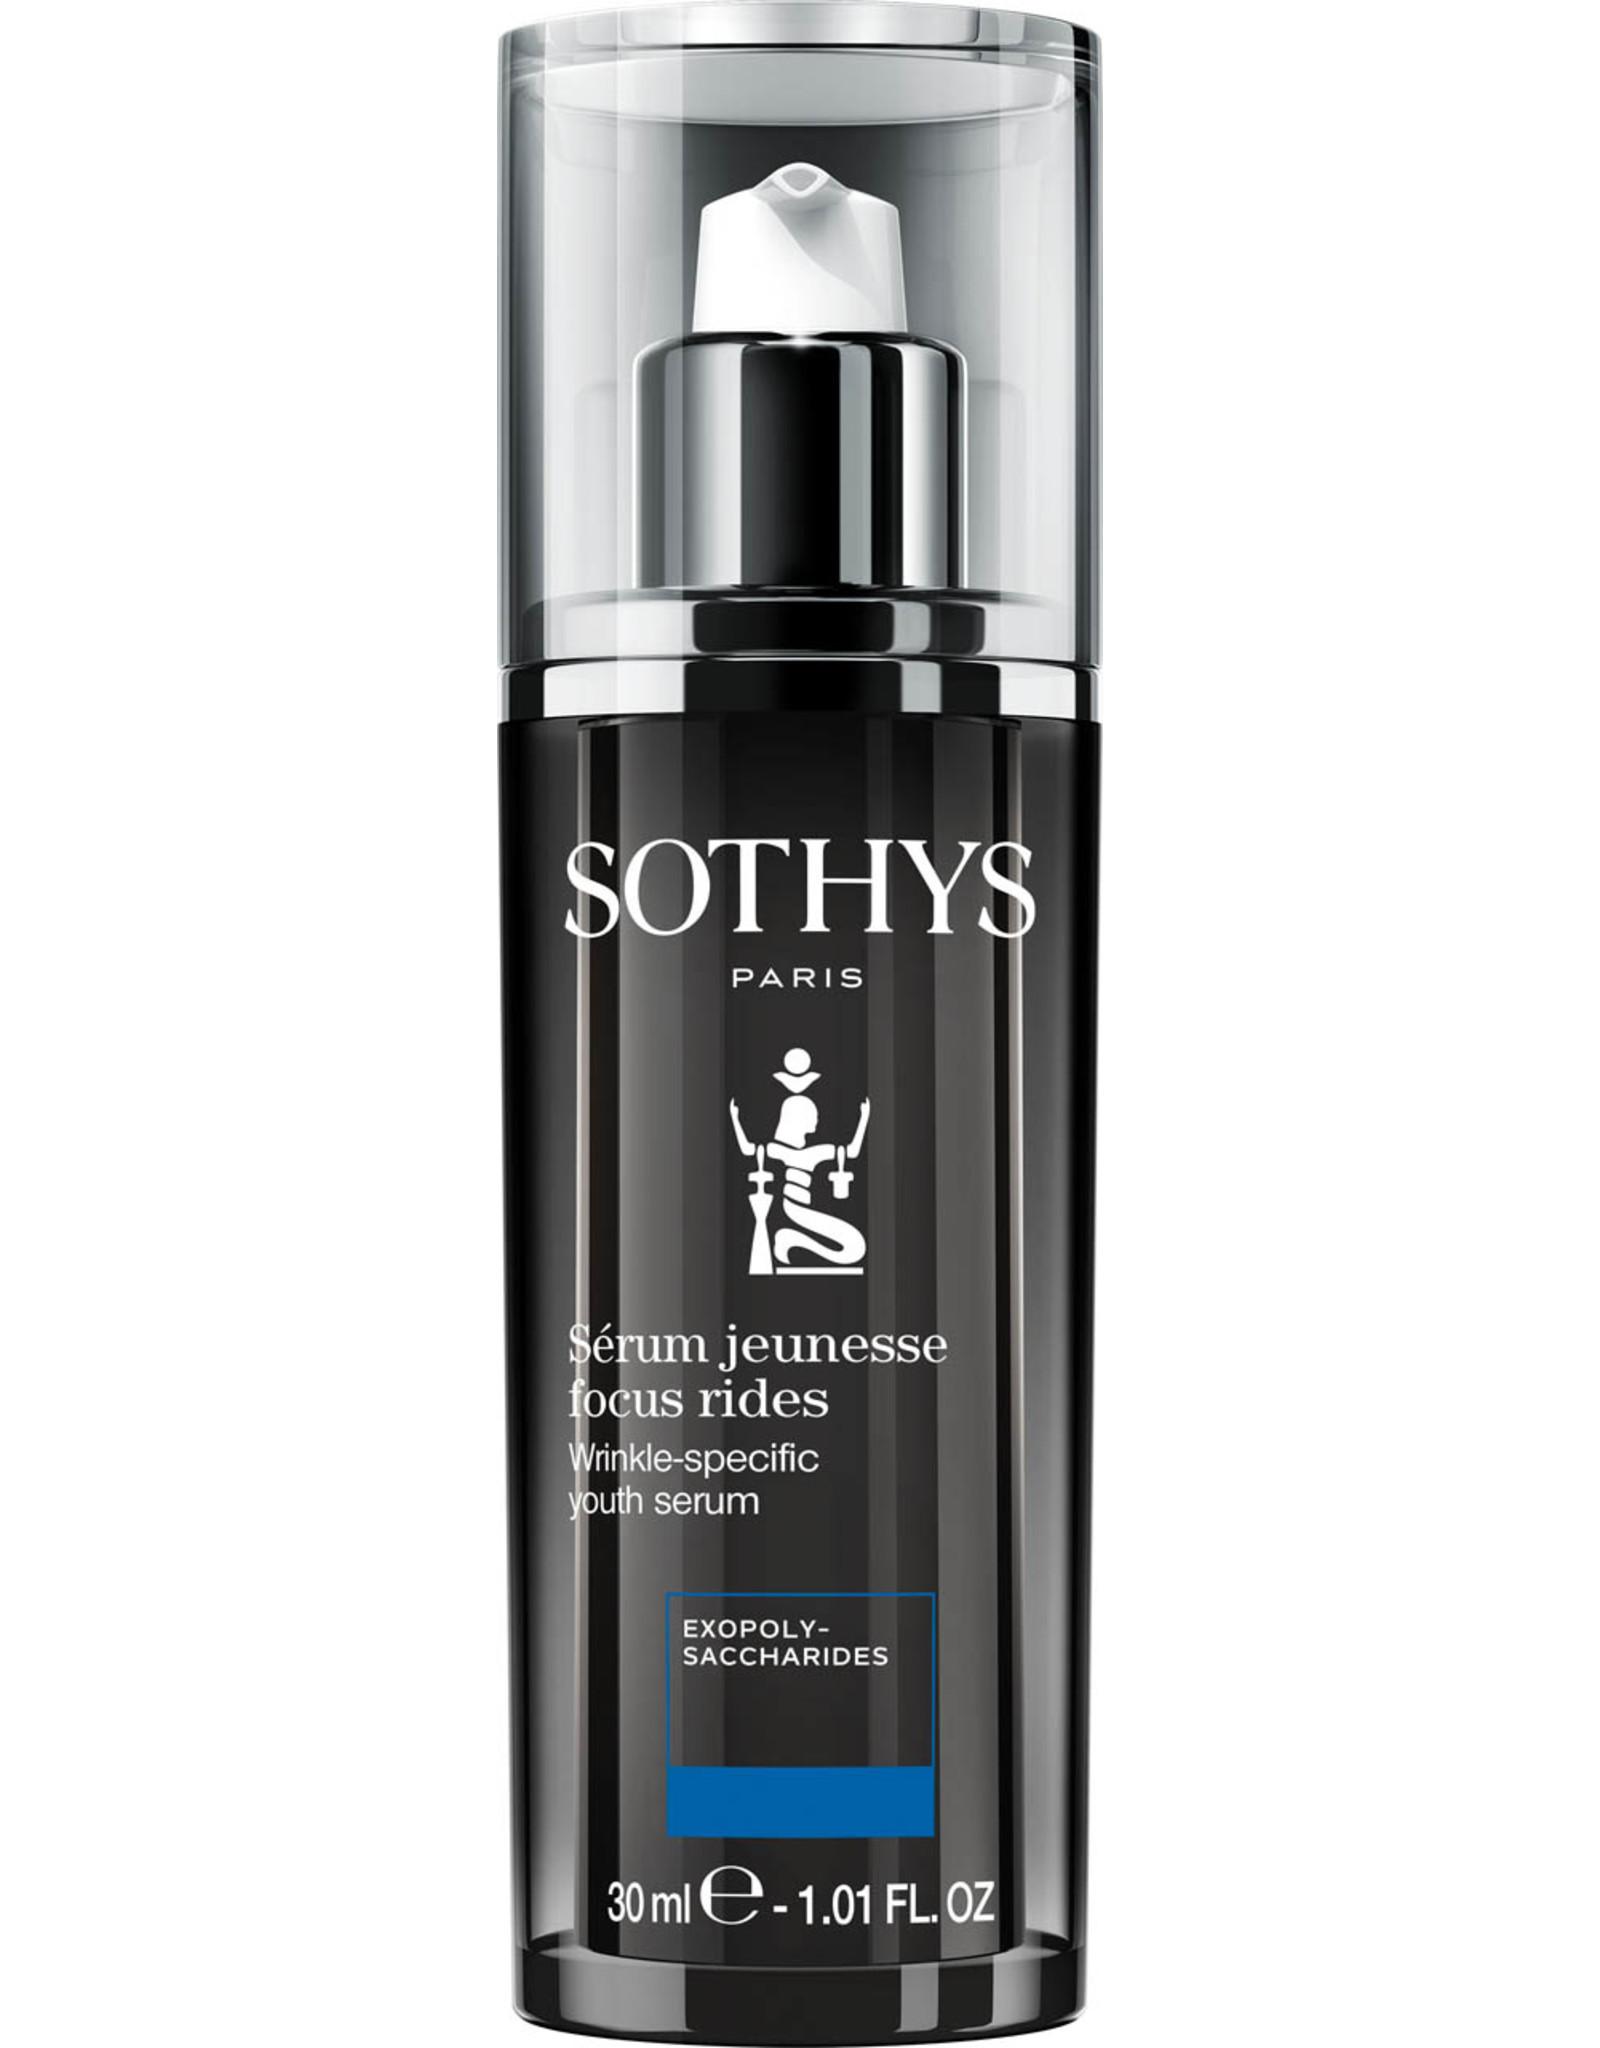 SOTHYS Sérum jeunesse focus rides - Sothys